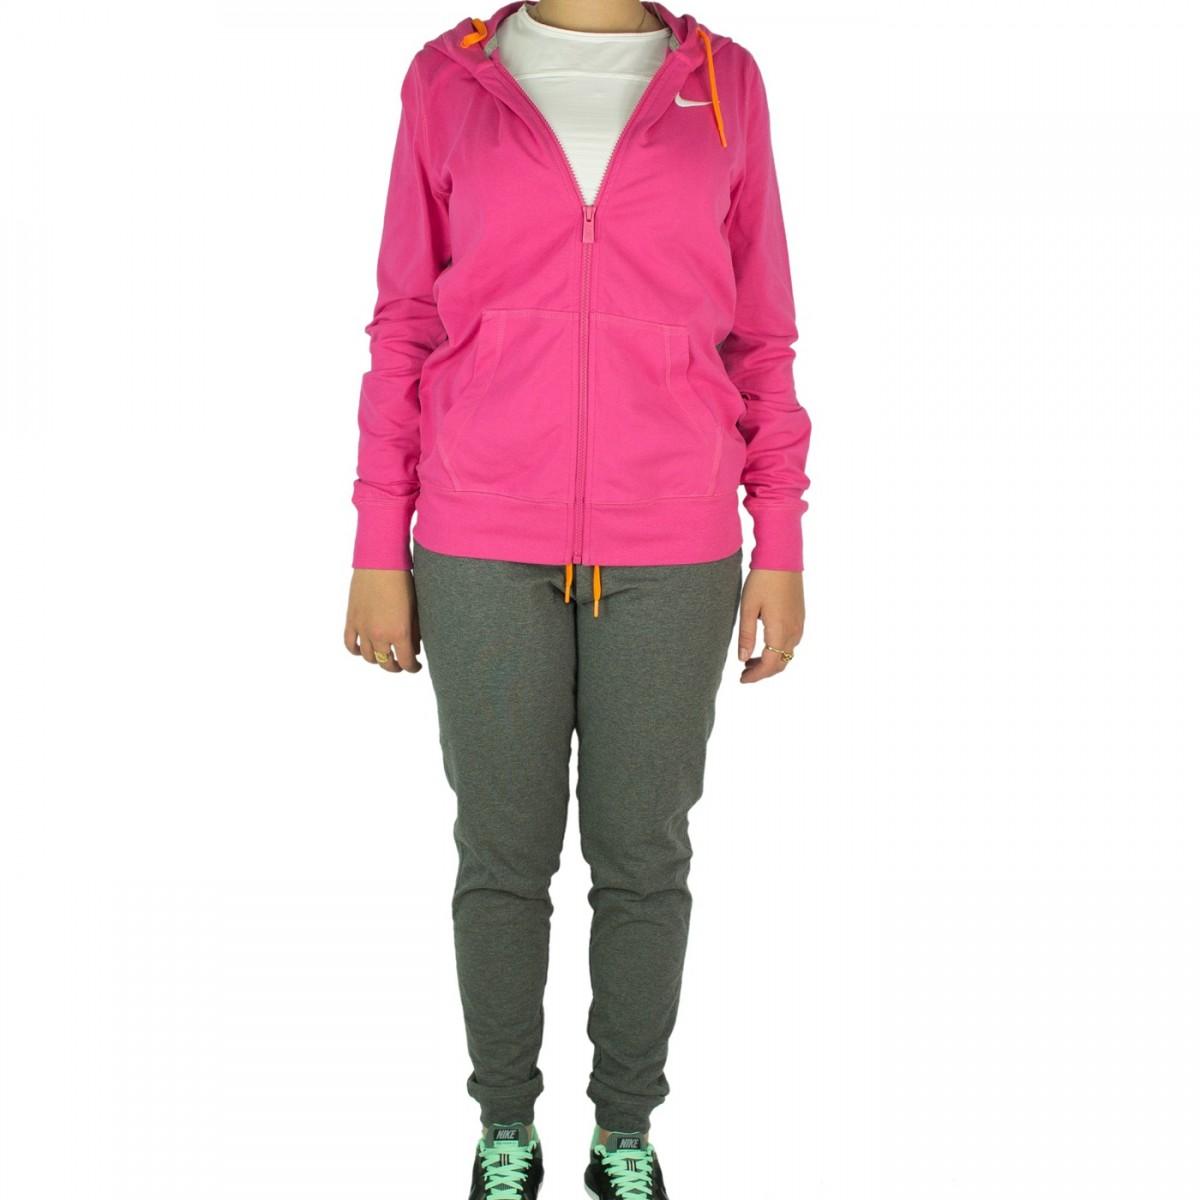 Bizz Store - Agasalho Feminino Nike Jersey Cuffed Pink Esportivo b333e51fea641